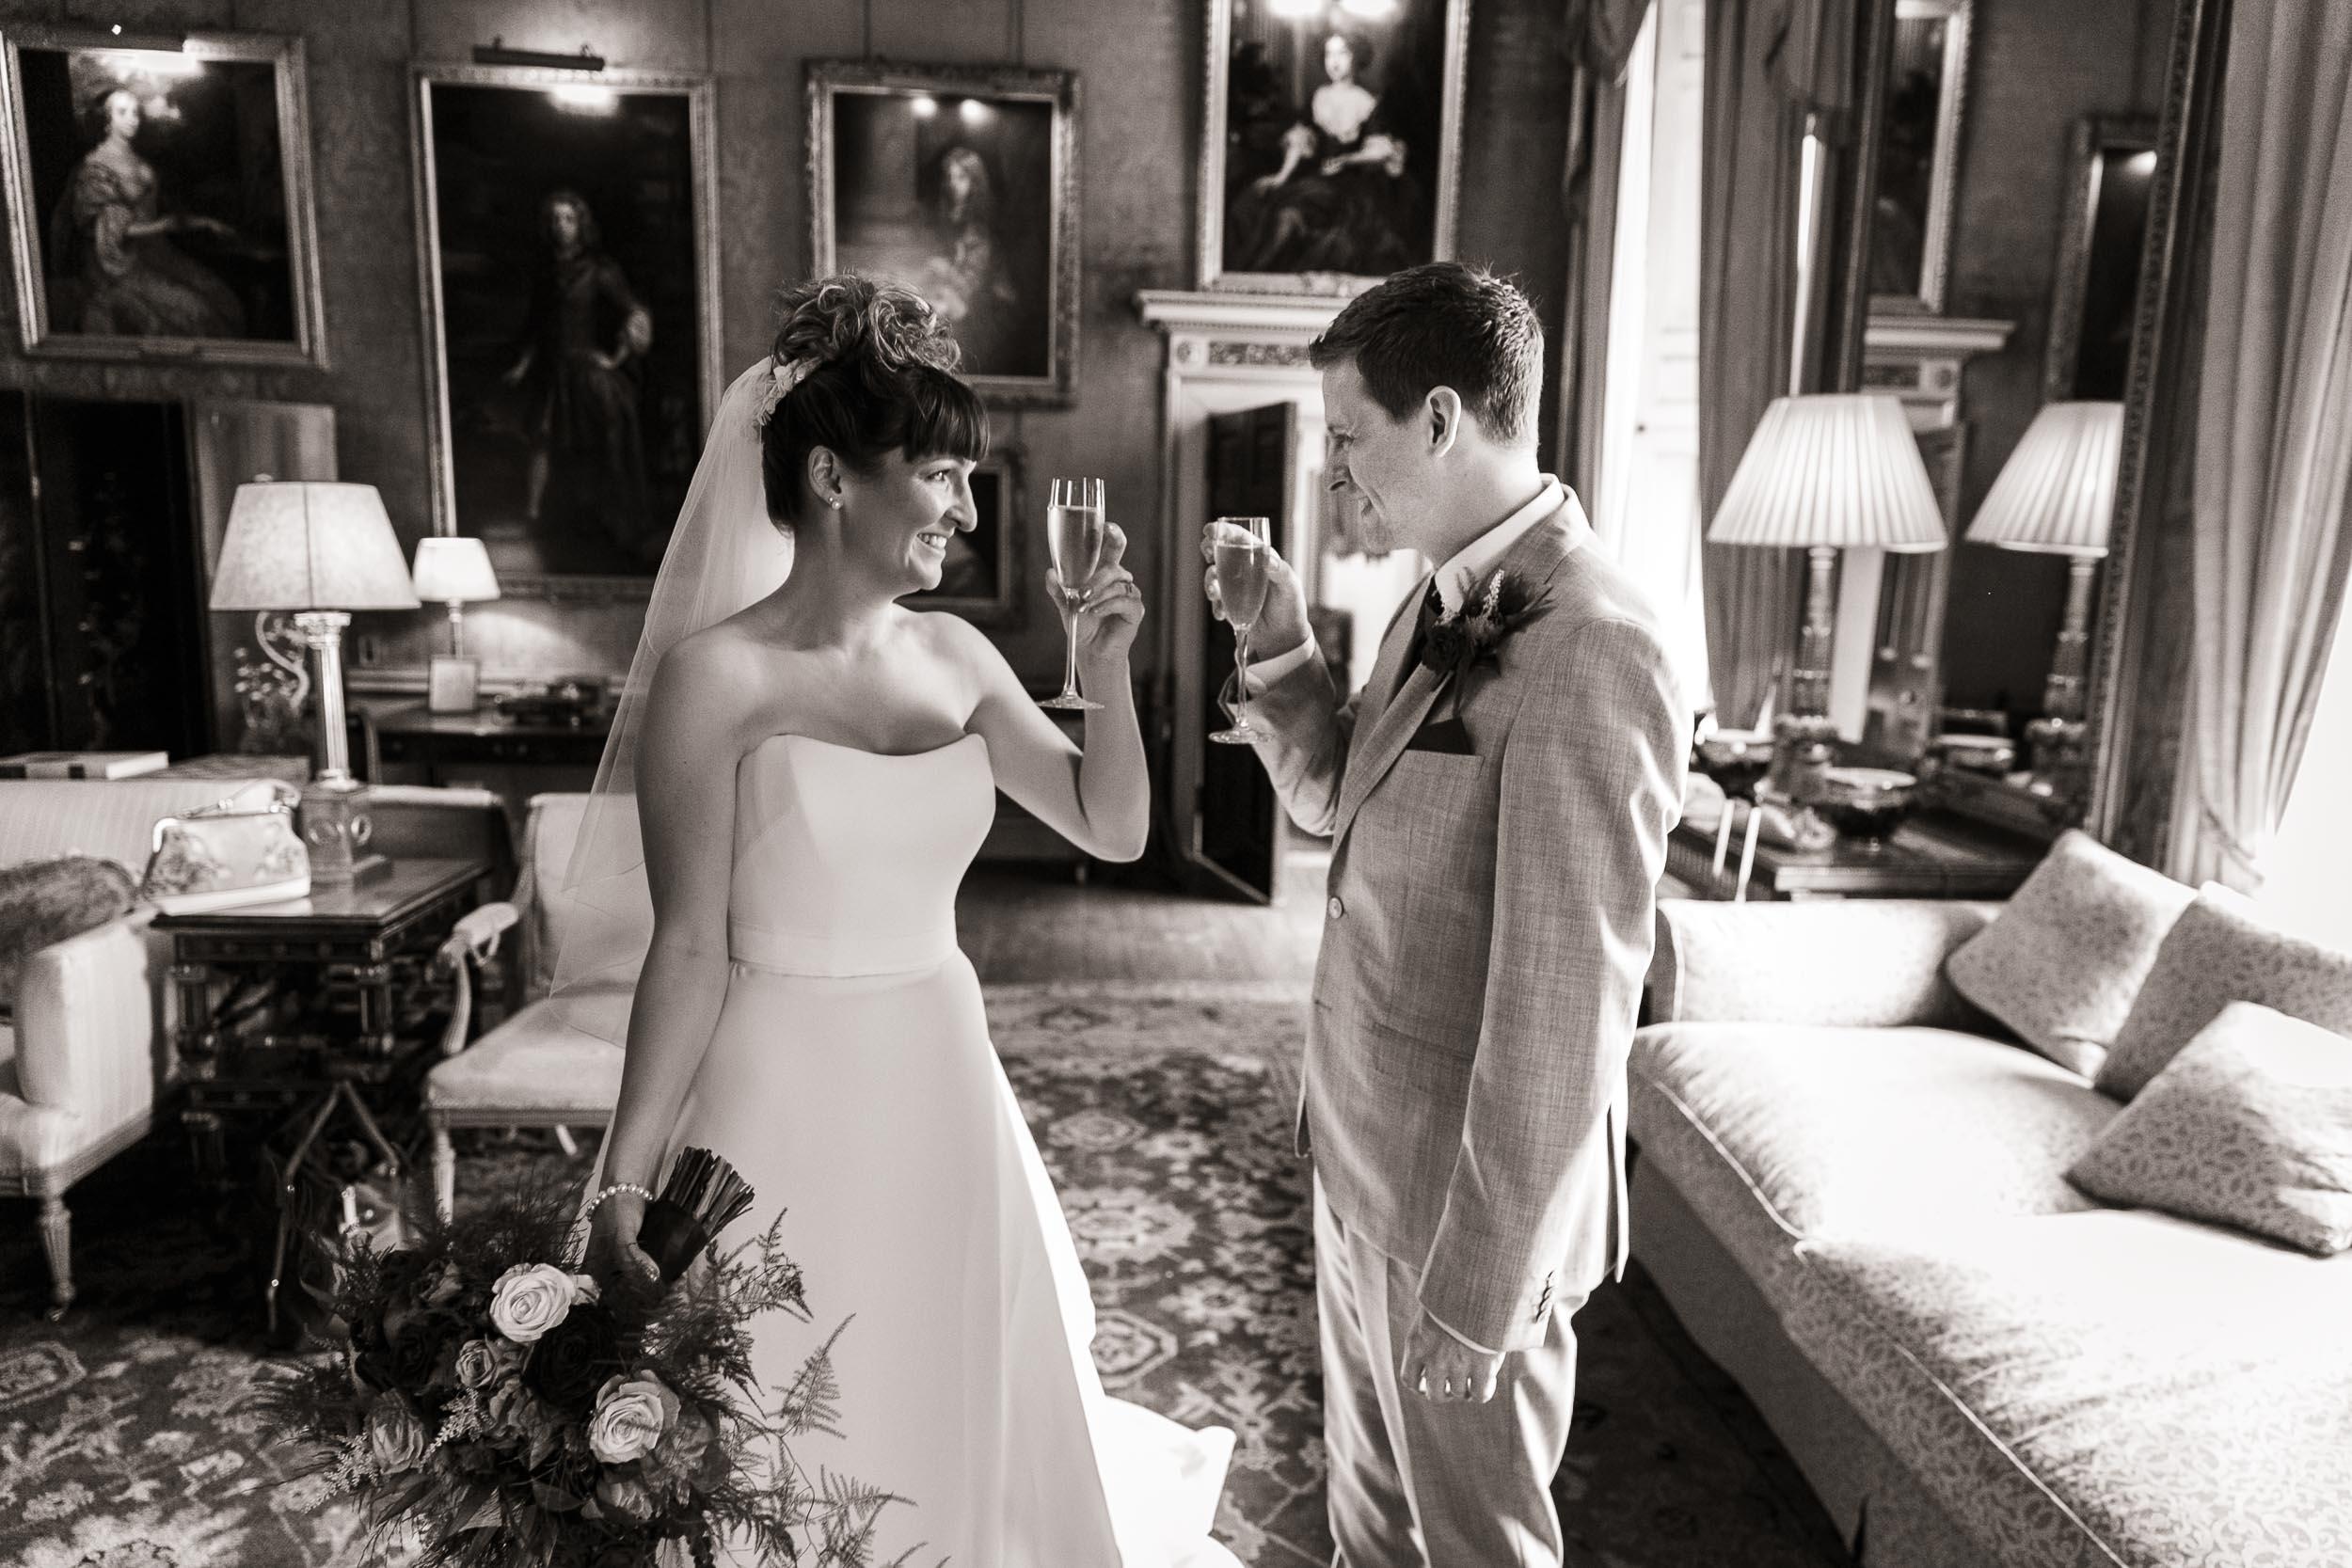 syon-house-wedding-photographer-london 077.jpg